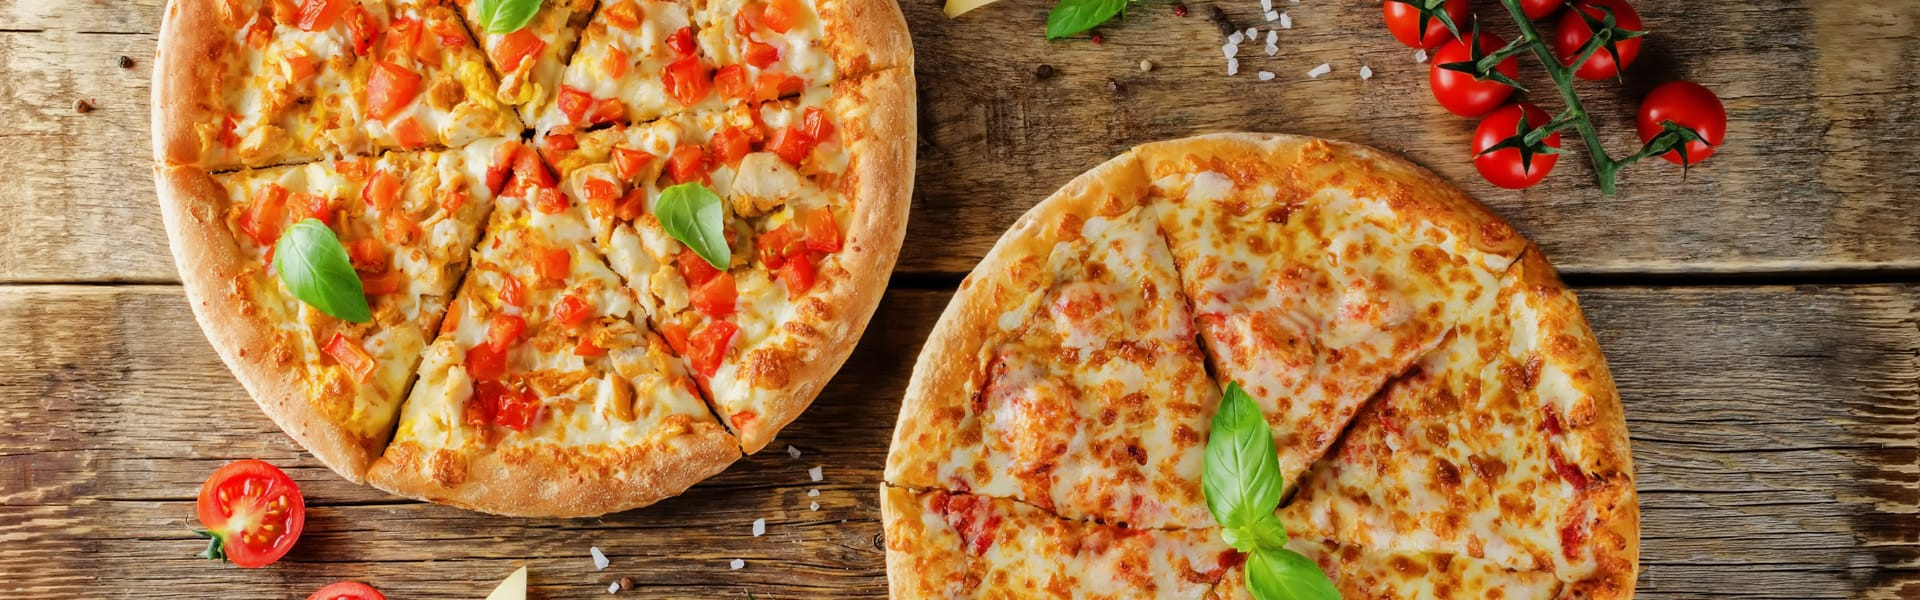 Second Pizza - Alexis Nihon